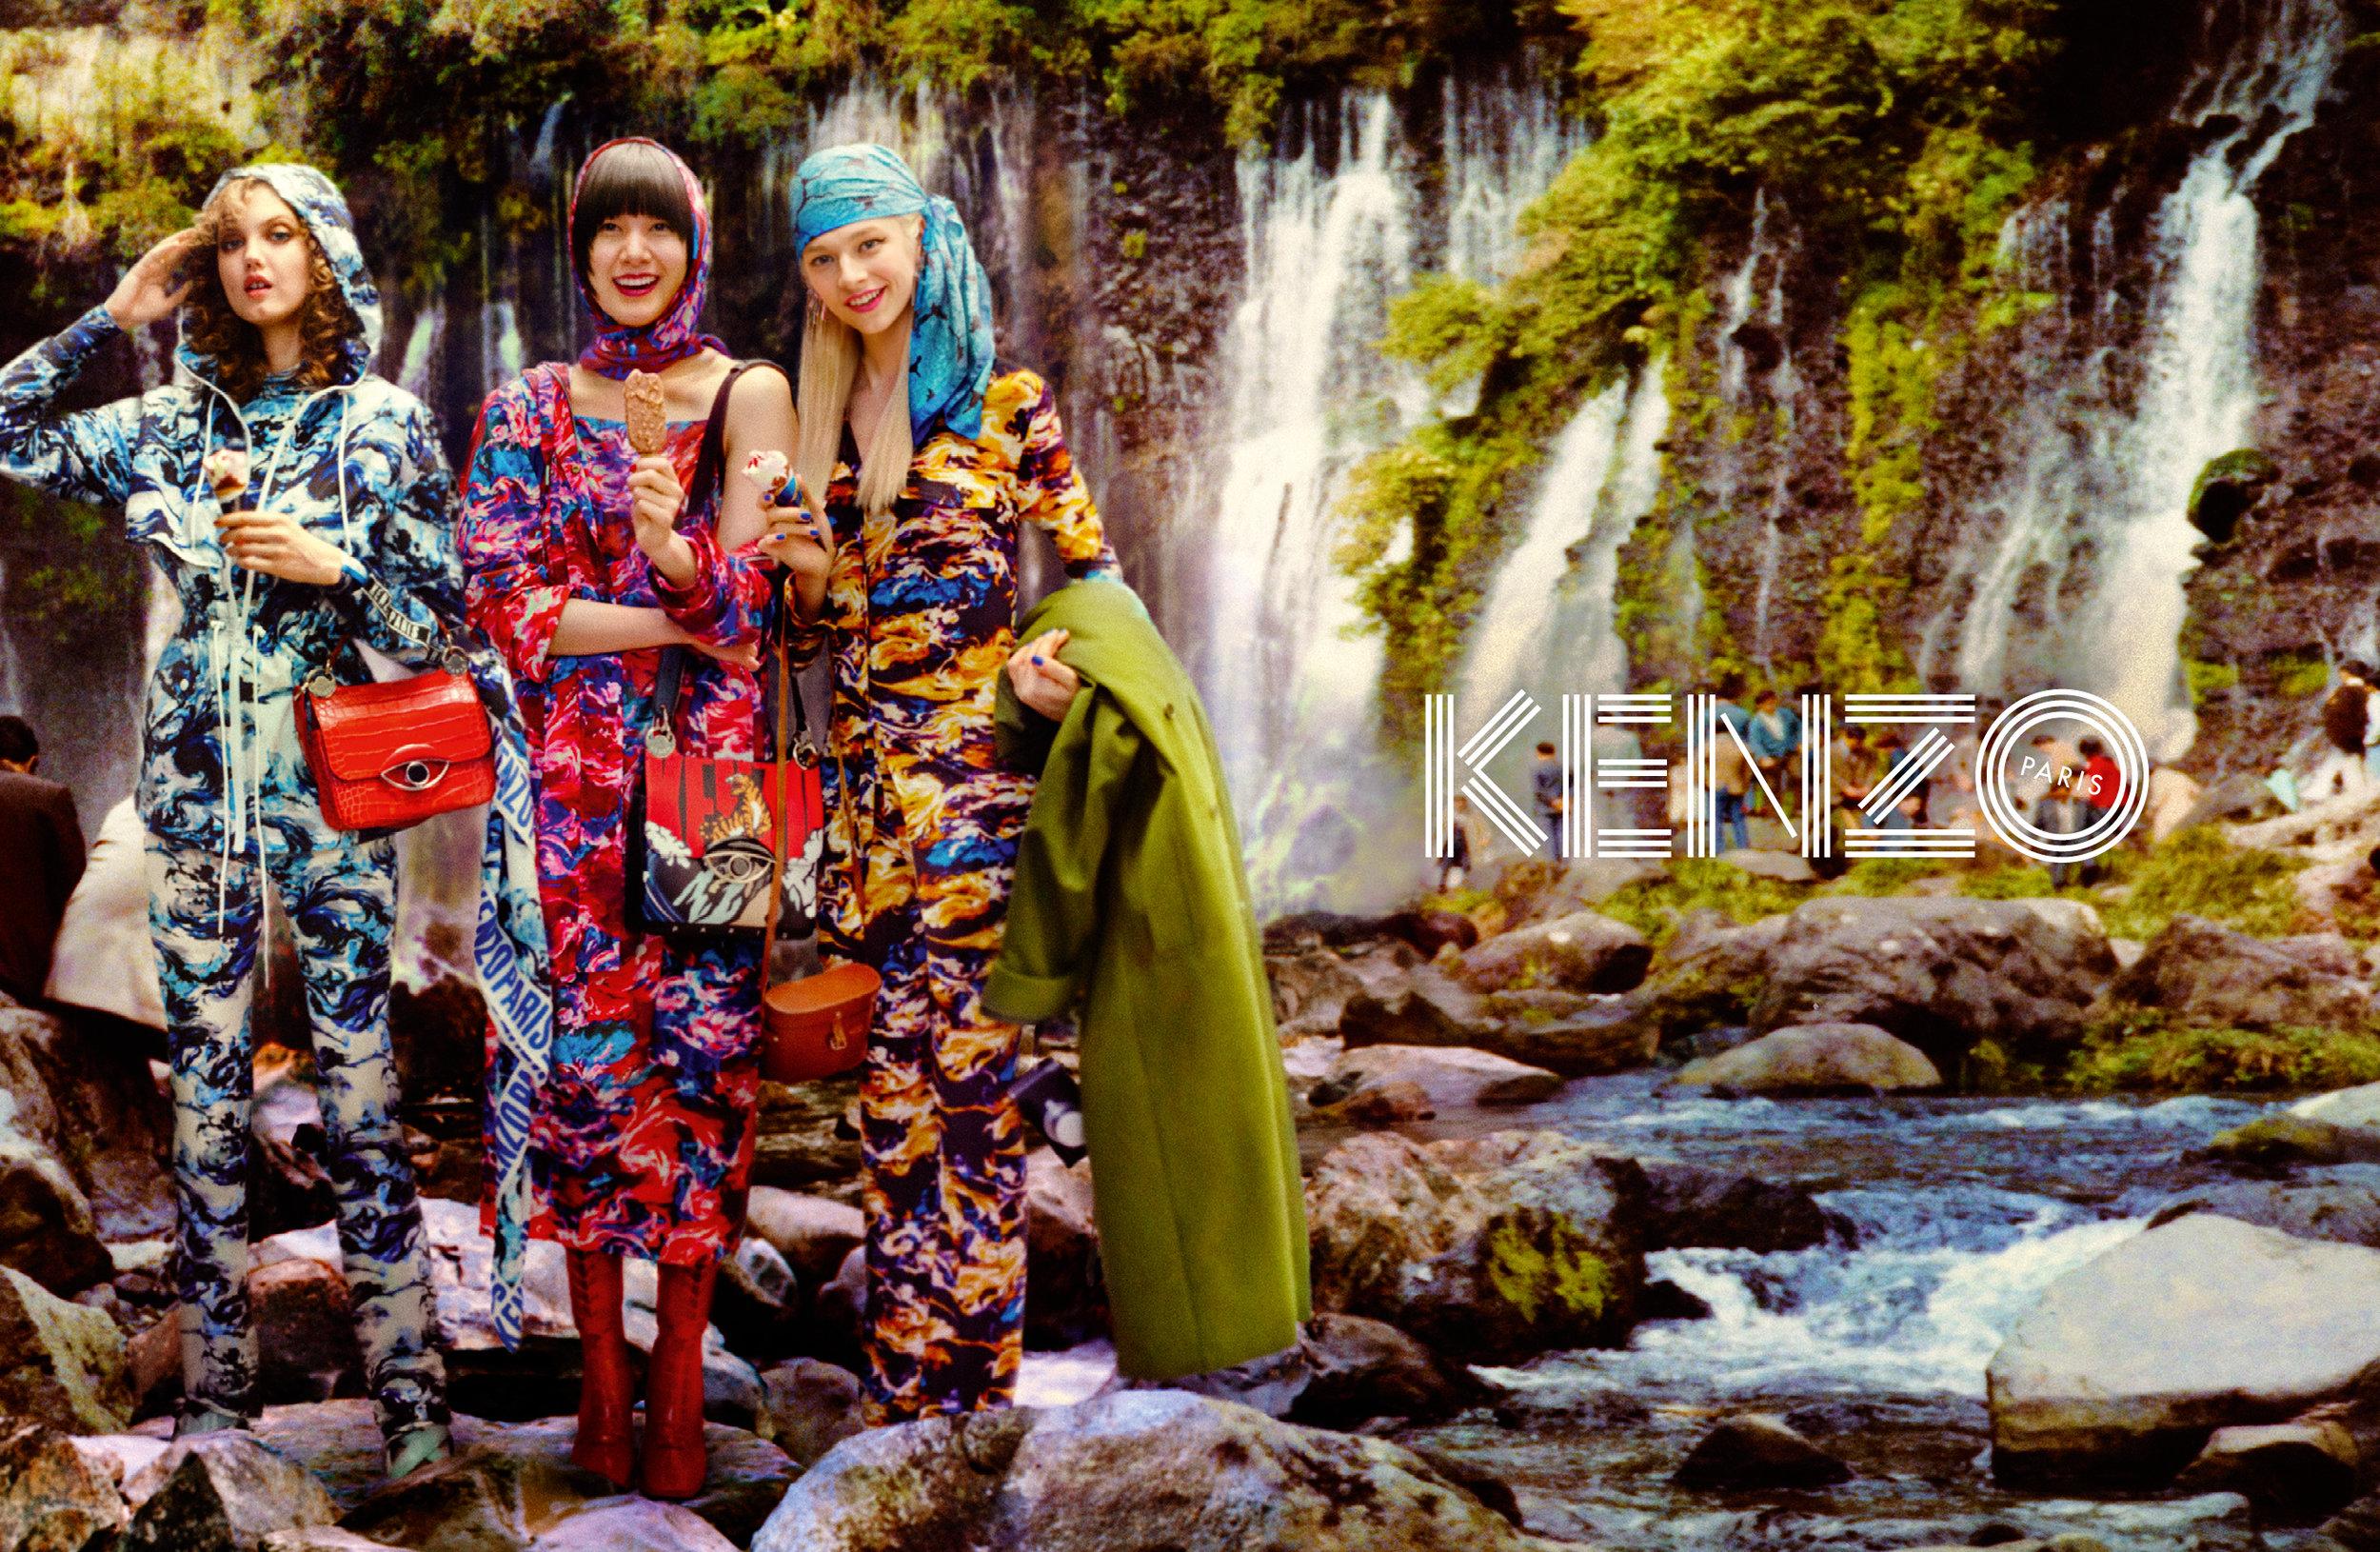 kenzo_fall_2019_campaign3.jpg